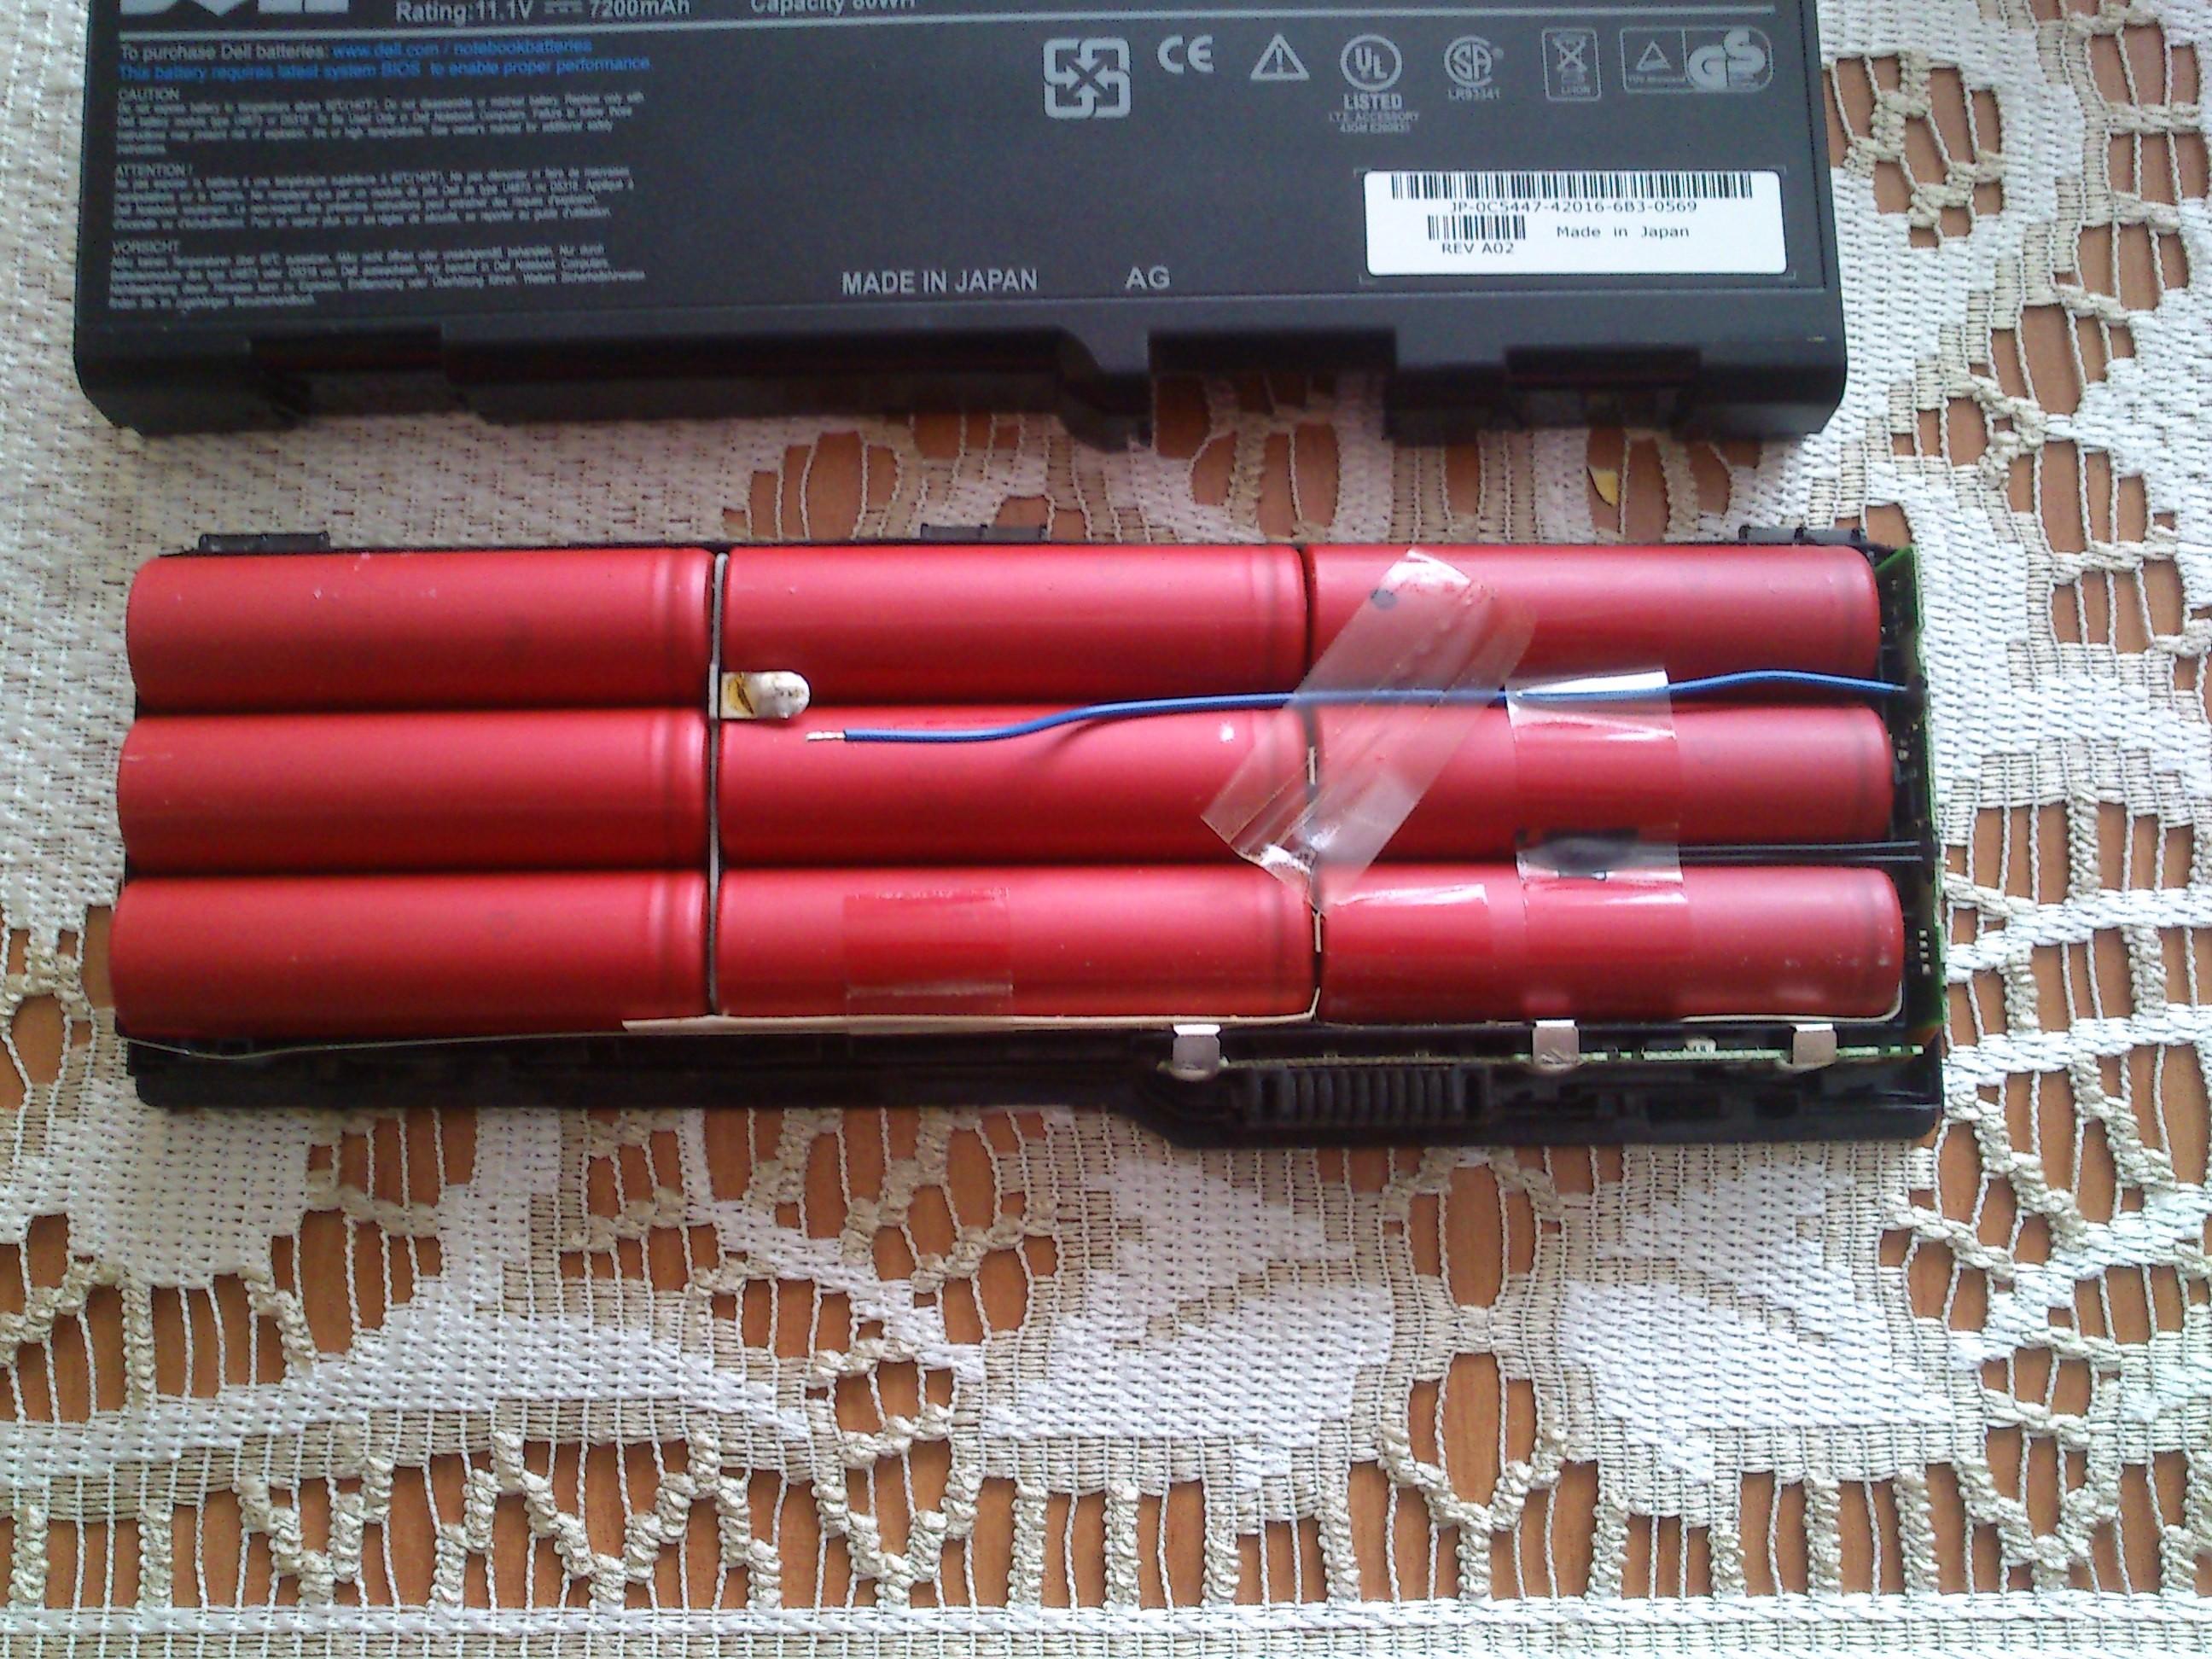 Dell XPS M1710 - Regeneracja baterii